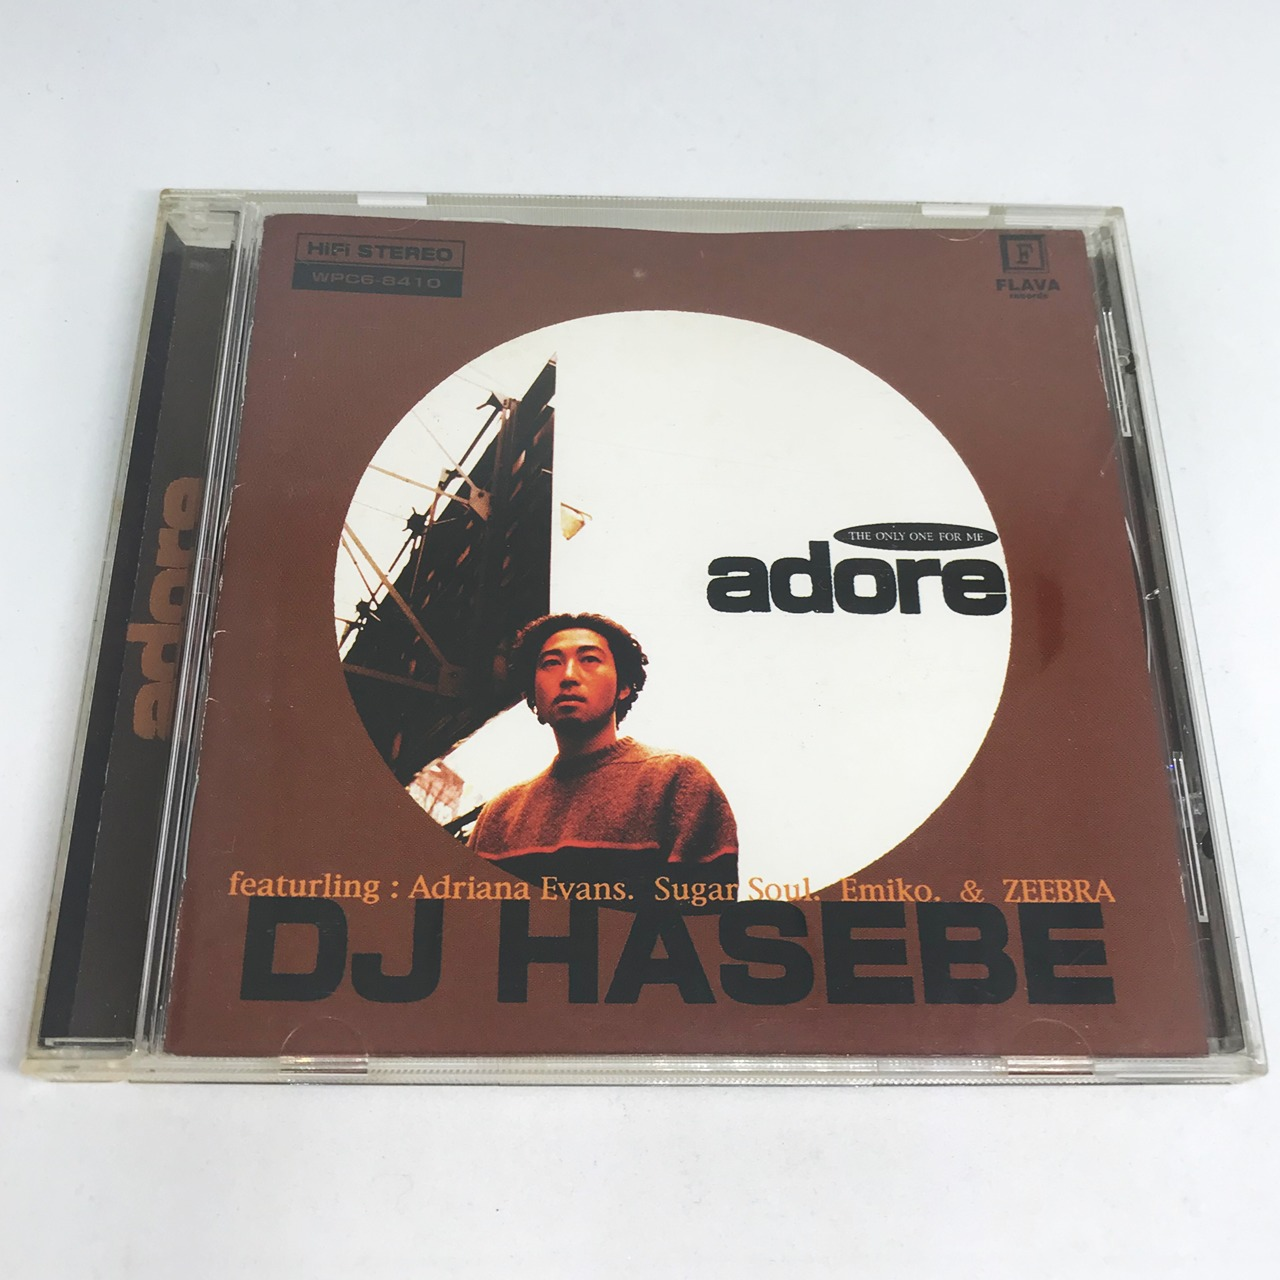 DJ HASEBE / adore